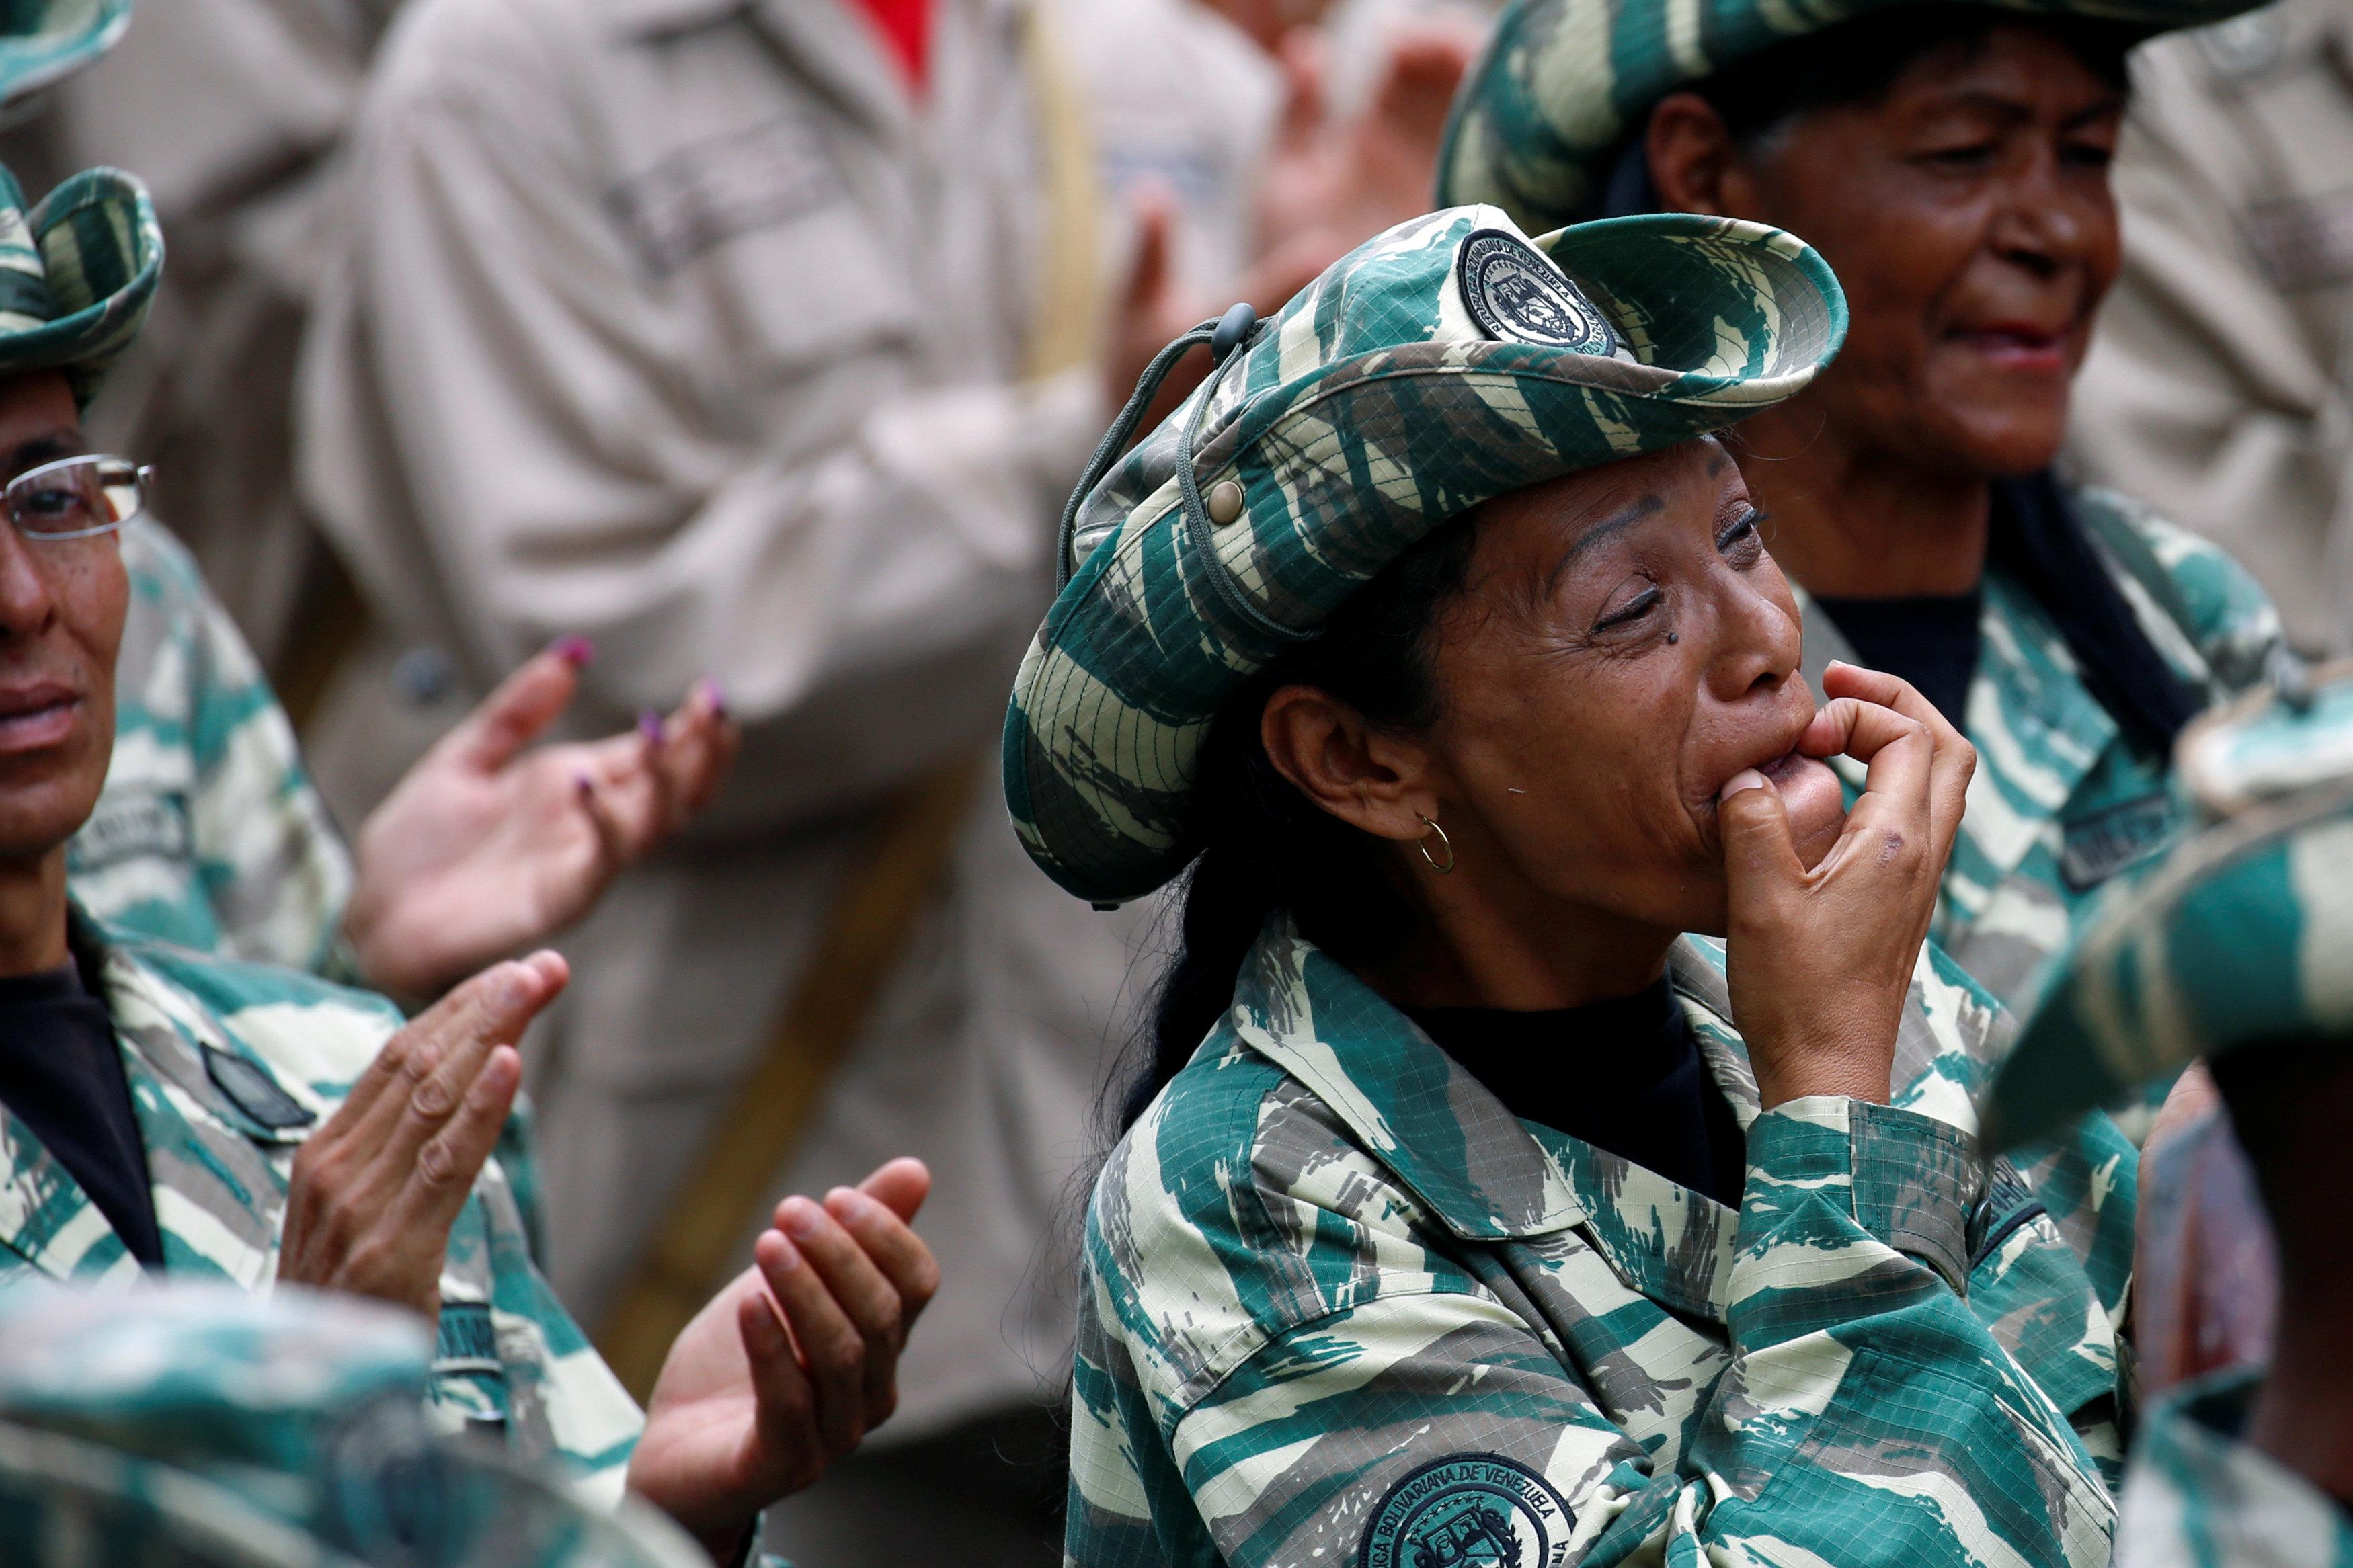 A militia member whistles during a ceremony with Venezuela's President Nicolas Maduro at Miraflores Palace in Caracas, Venezuela April 17, 2017. REUTERS/Marco Bello